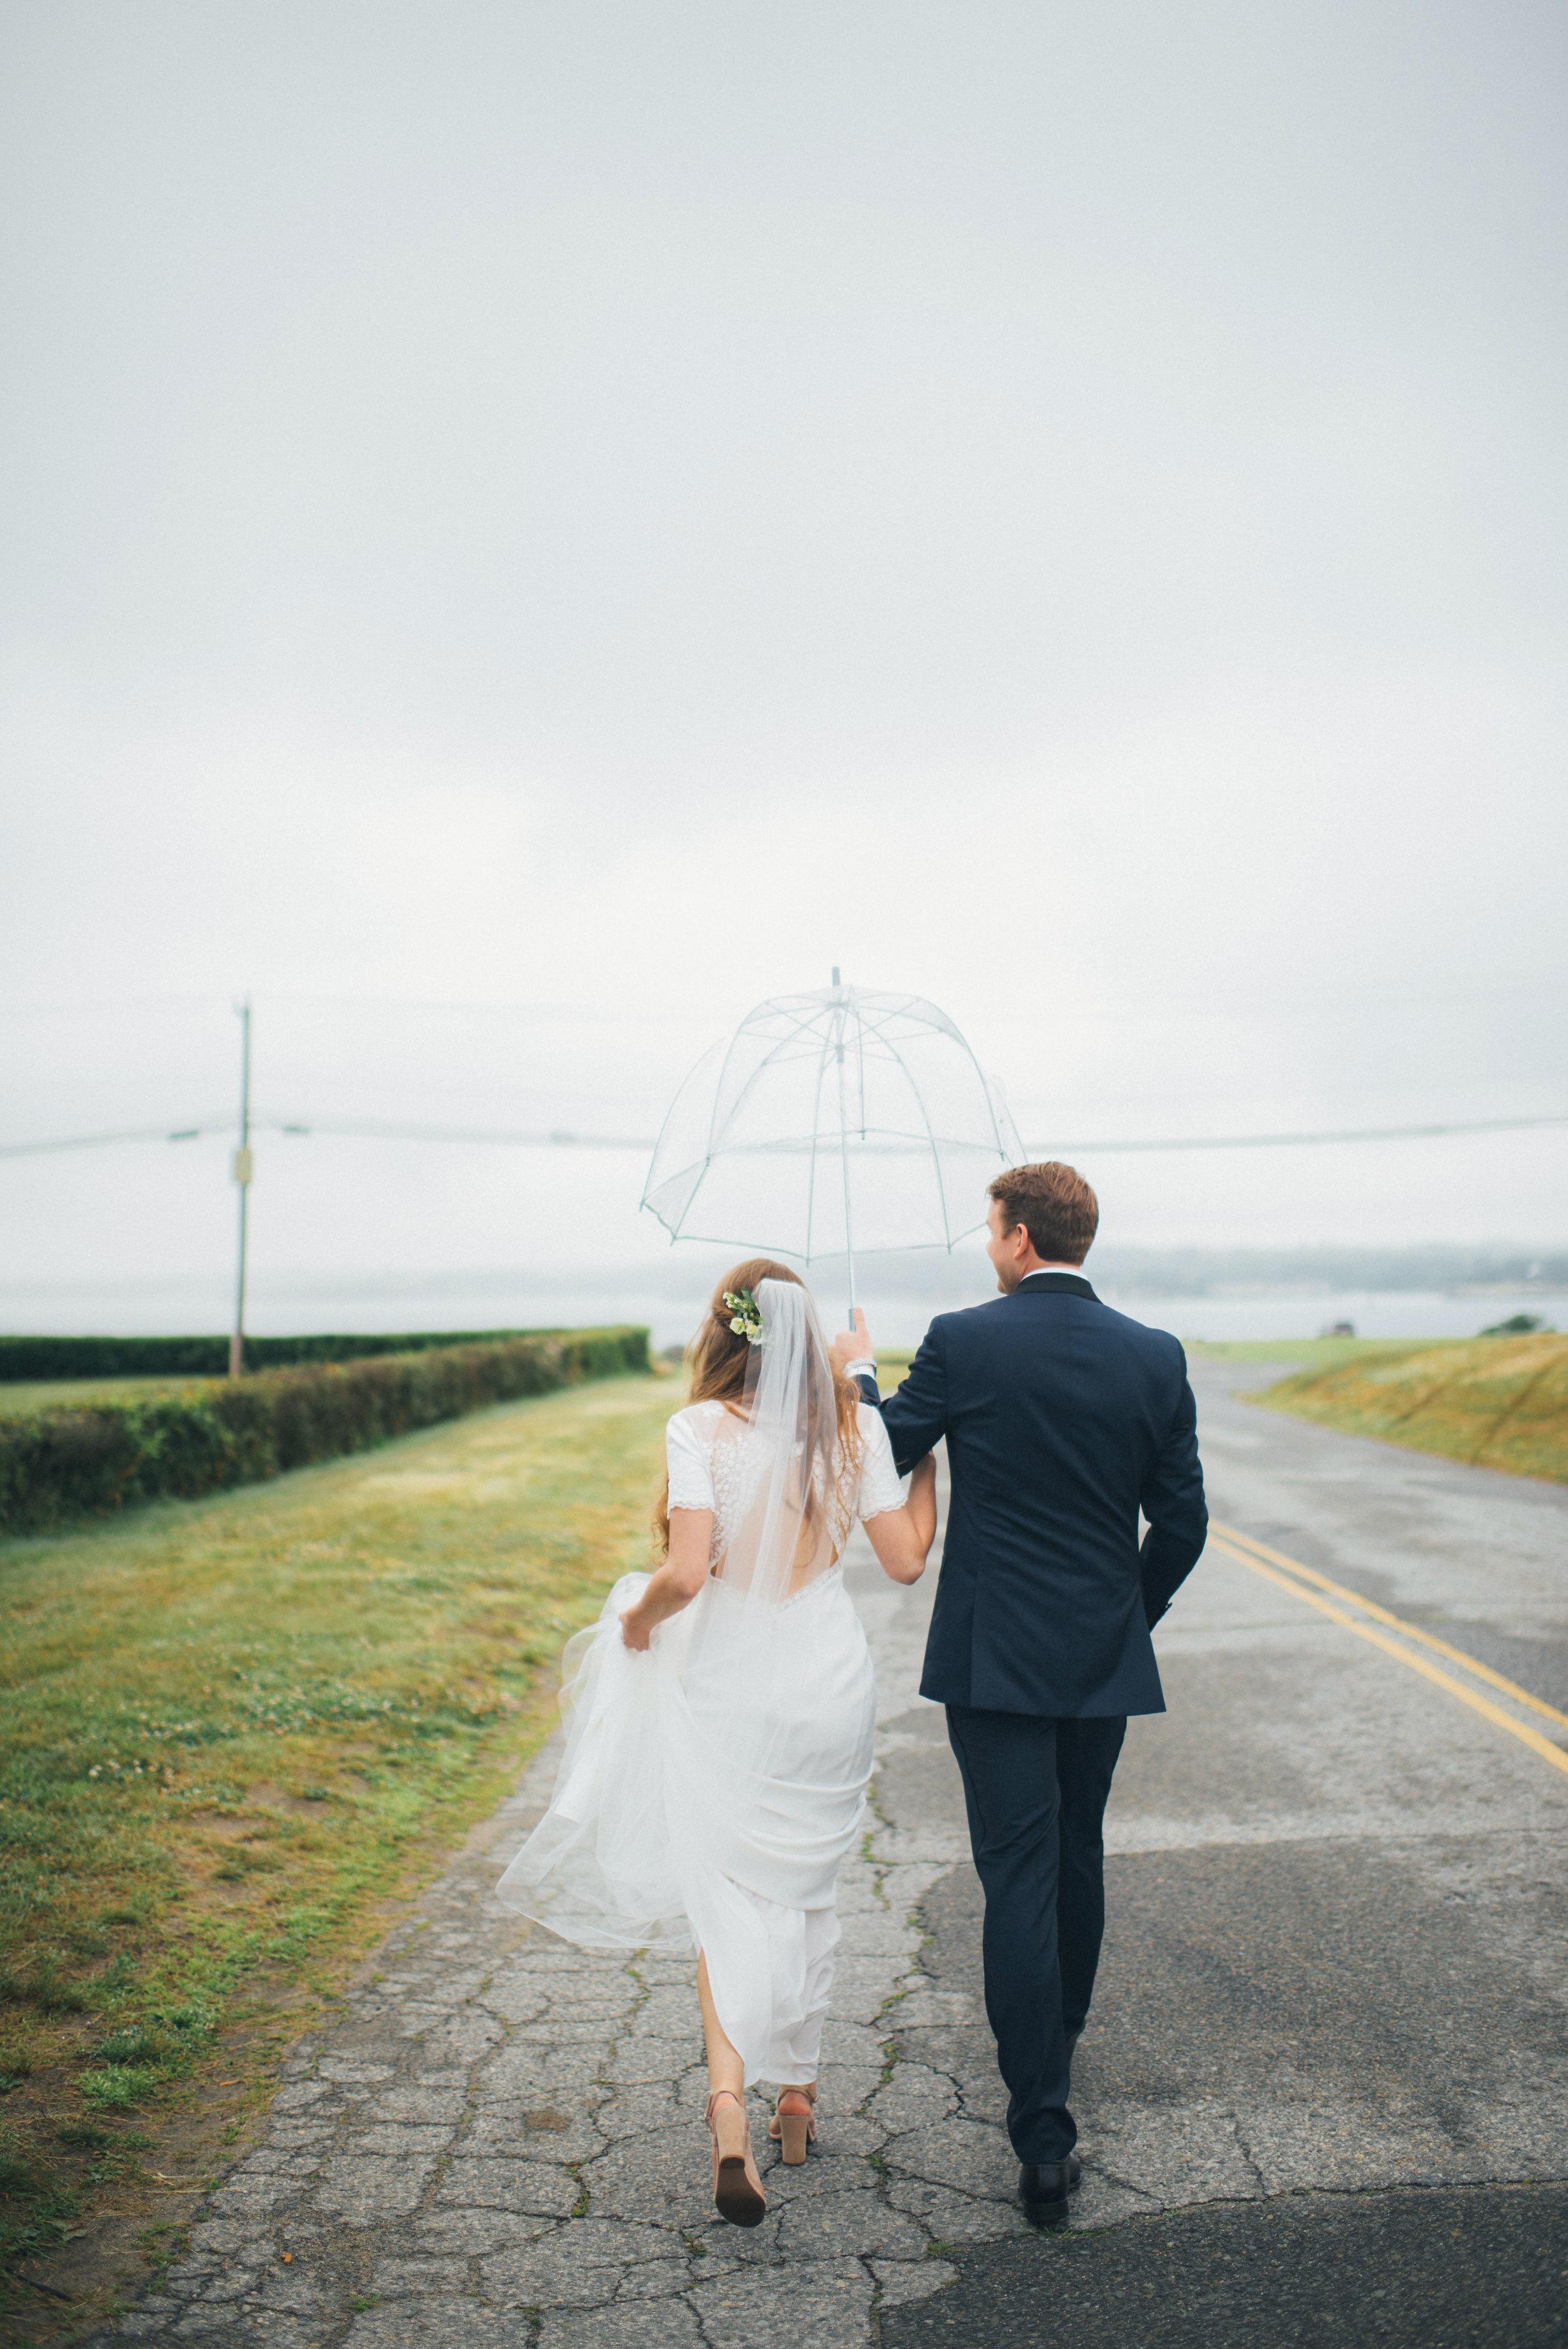 bride groom walk lake view road with umbrella